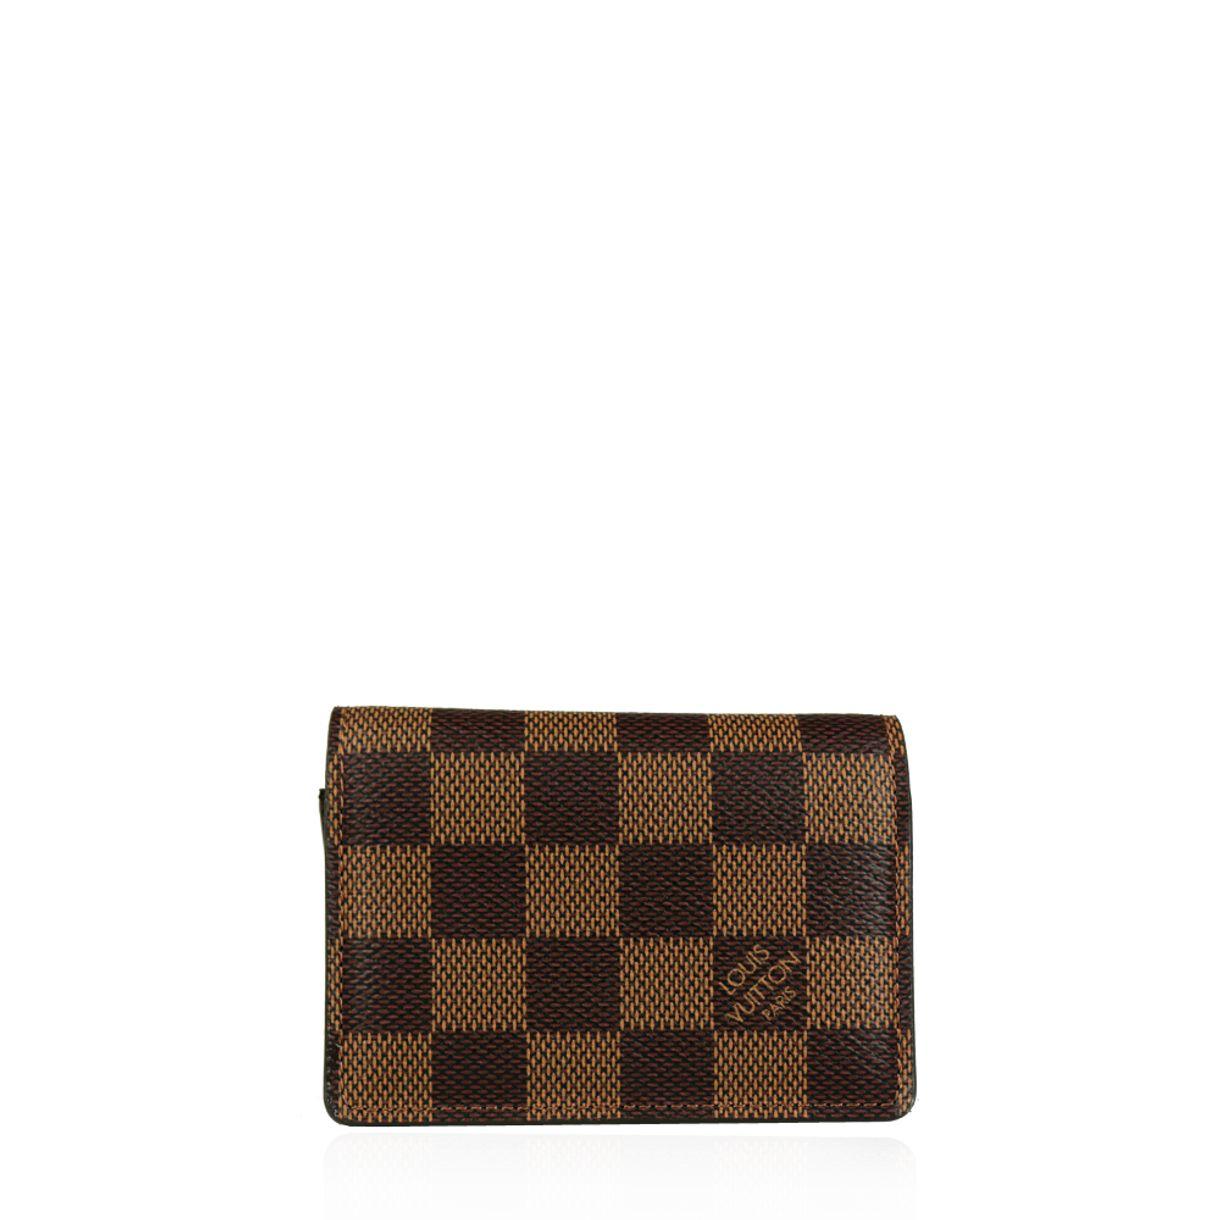 Mini-Carteira-Louis-Vuitton-Damier-Ebene